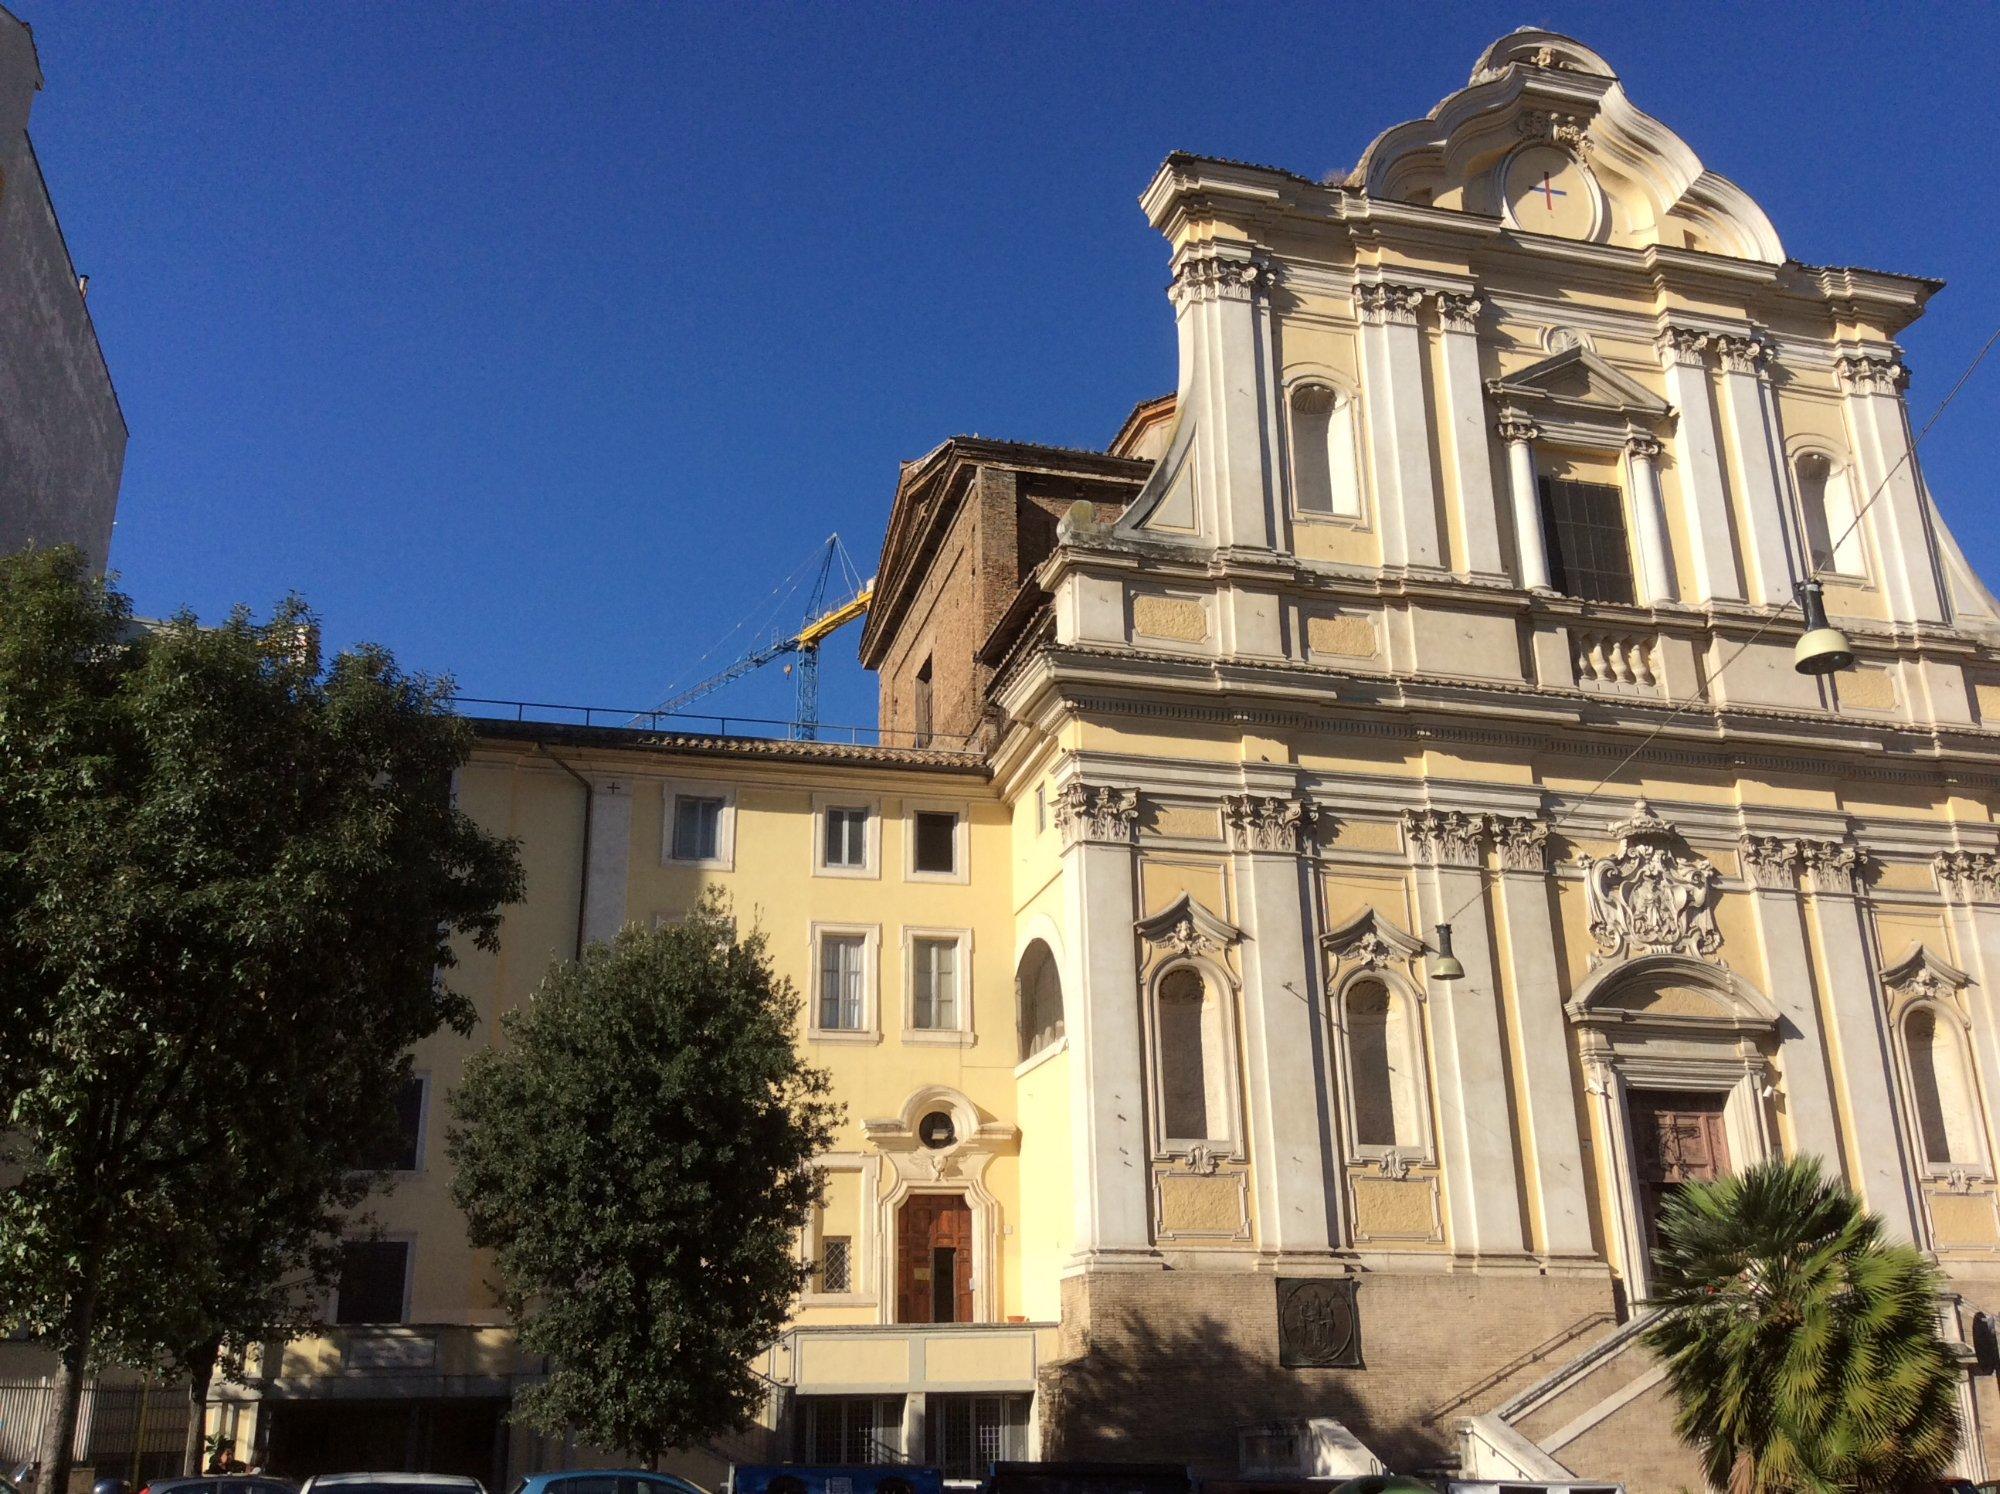 Casa Santa Maria alle Fornaci